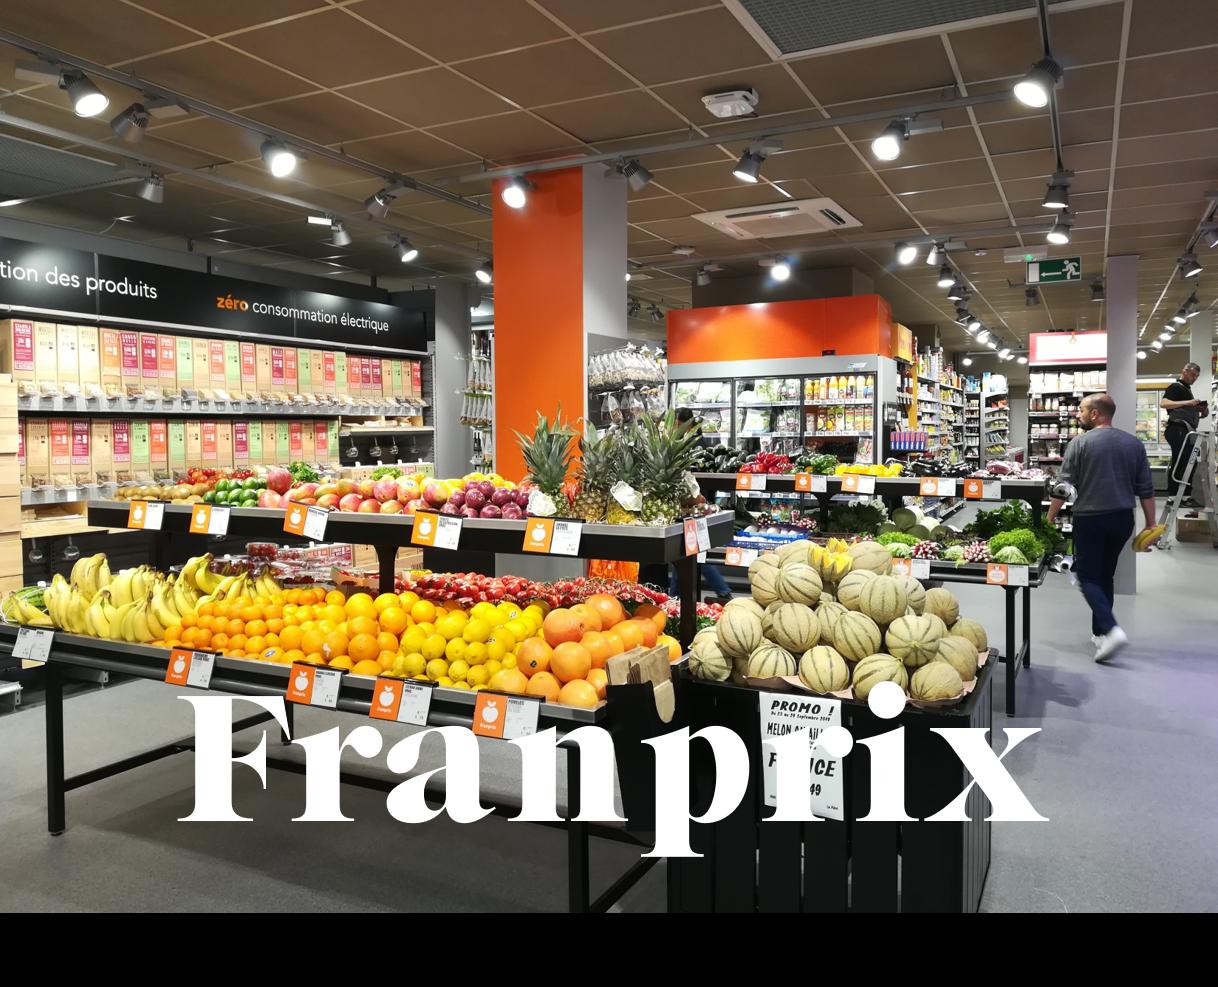 1- franprix-reaumur-vrac-zero-dechet-paris-retail-missions-mmm